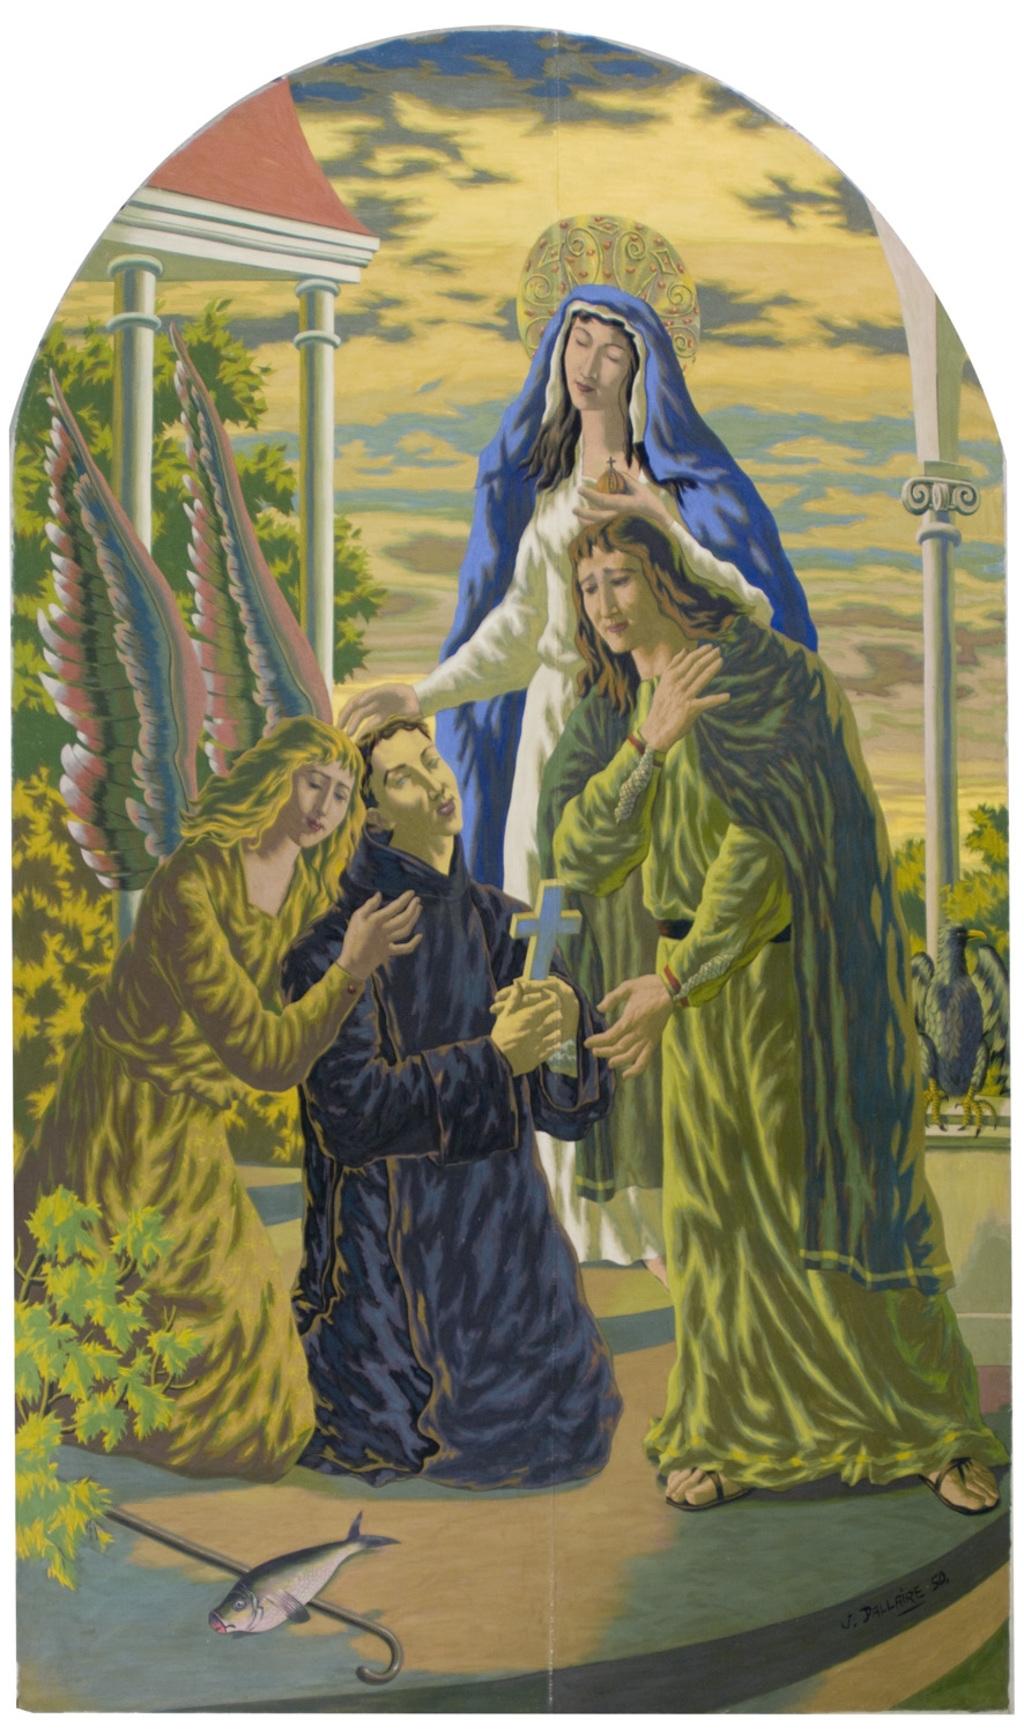 Saint Jean de Dieu